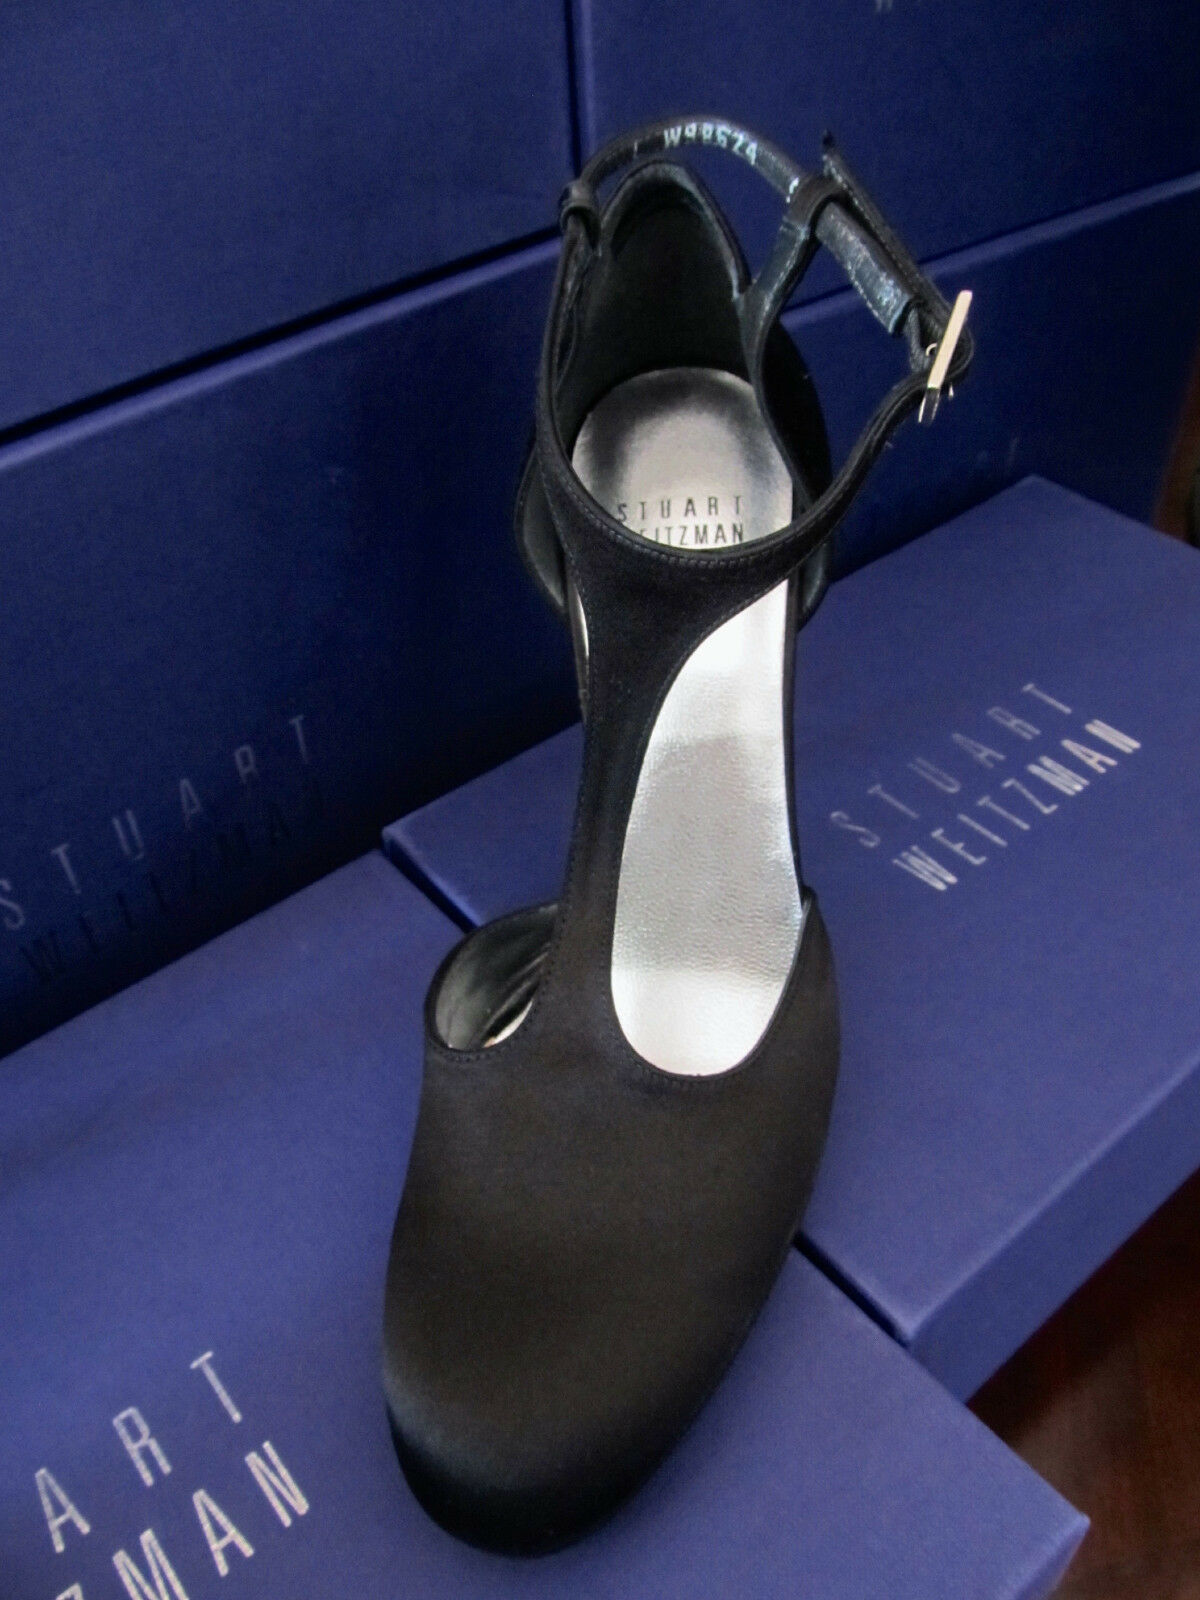 NEW STUART WEITZMAN Damenschuhe Schuhe SZ 7.5 GLOOVALTEE BLACK SATIN & LEATHER GLOOVALTEE 7.5 T STRAP 8cb329